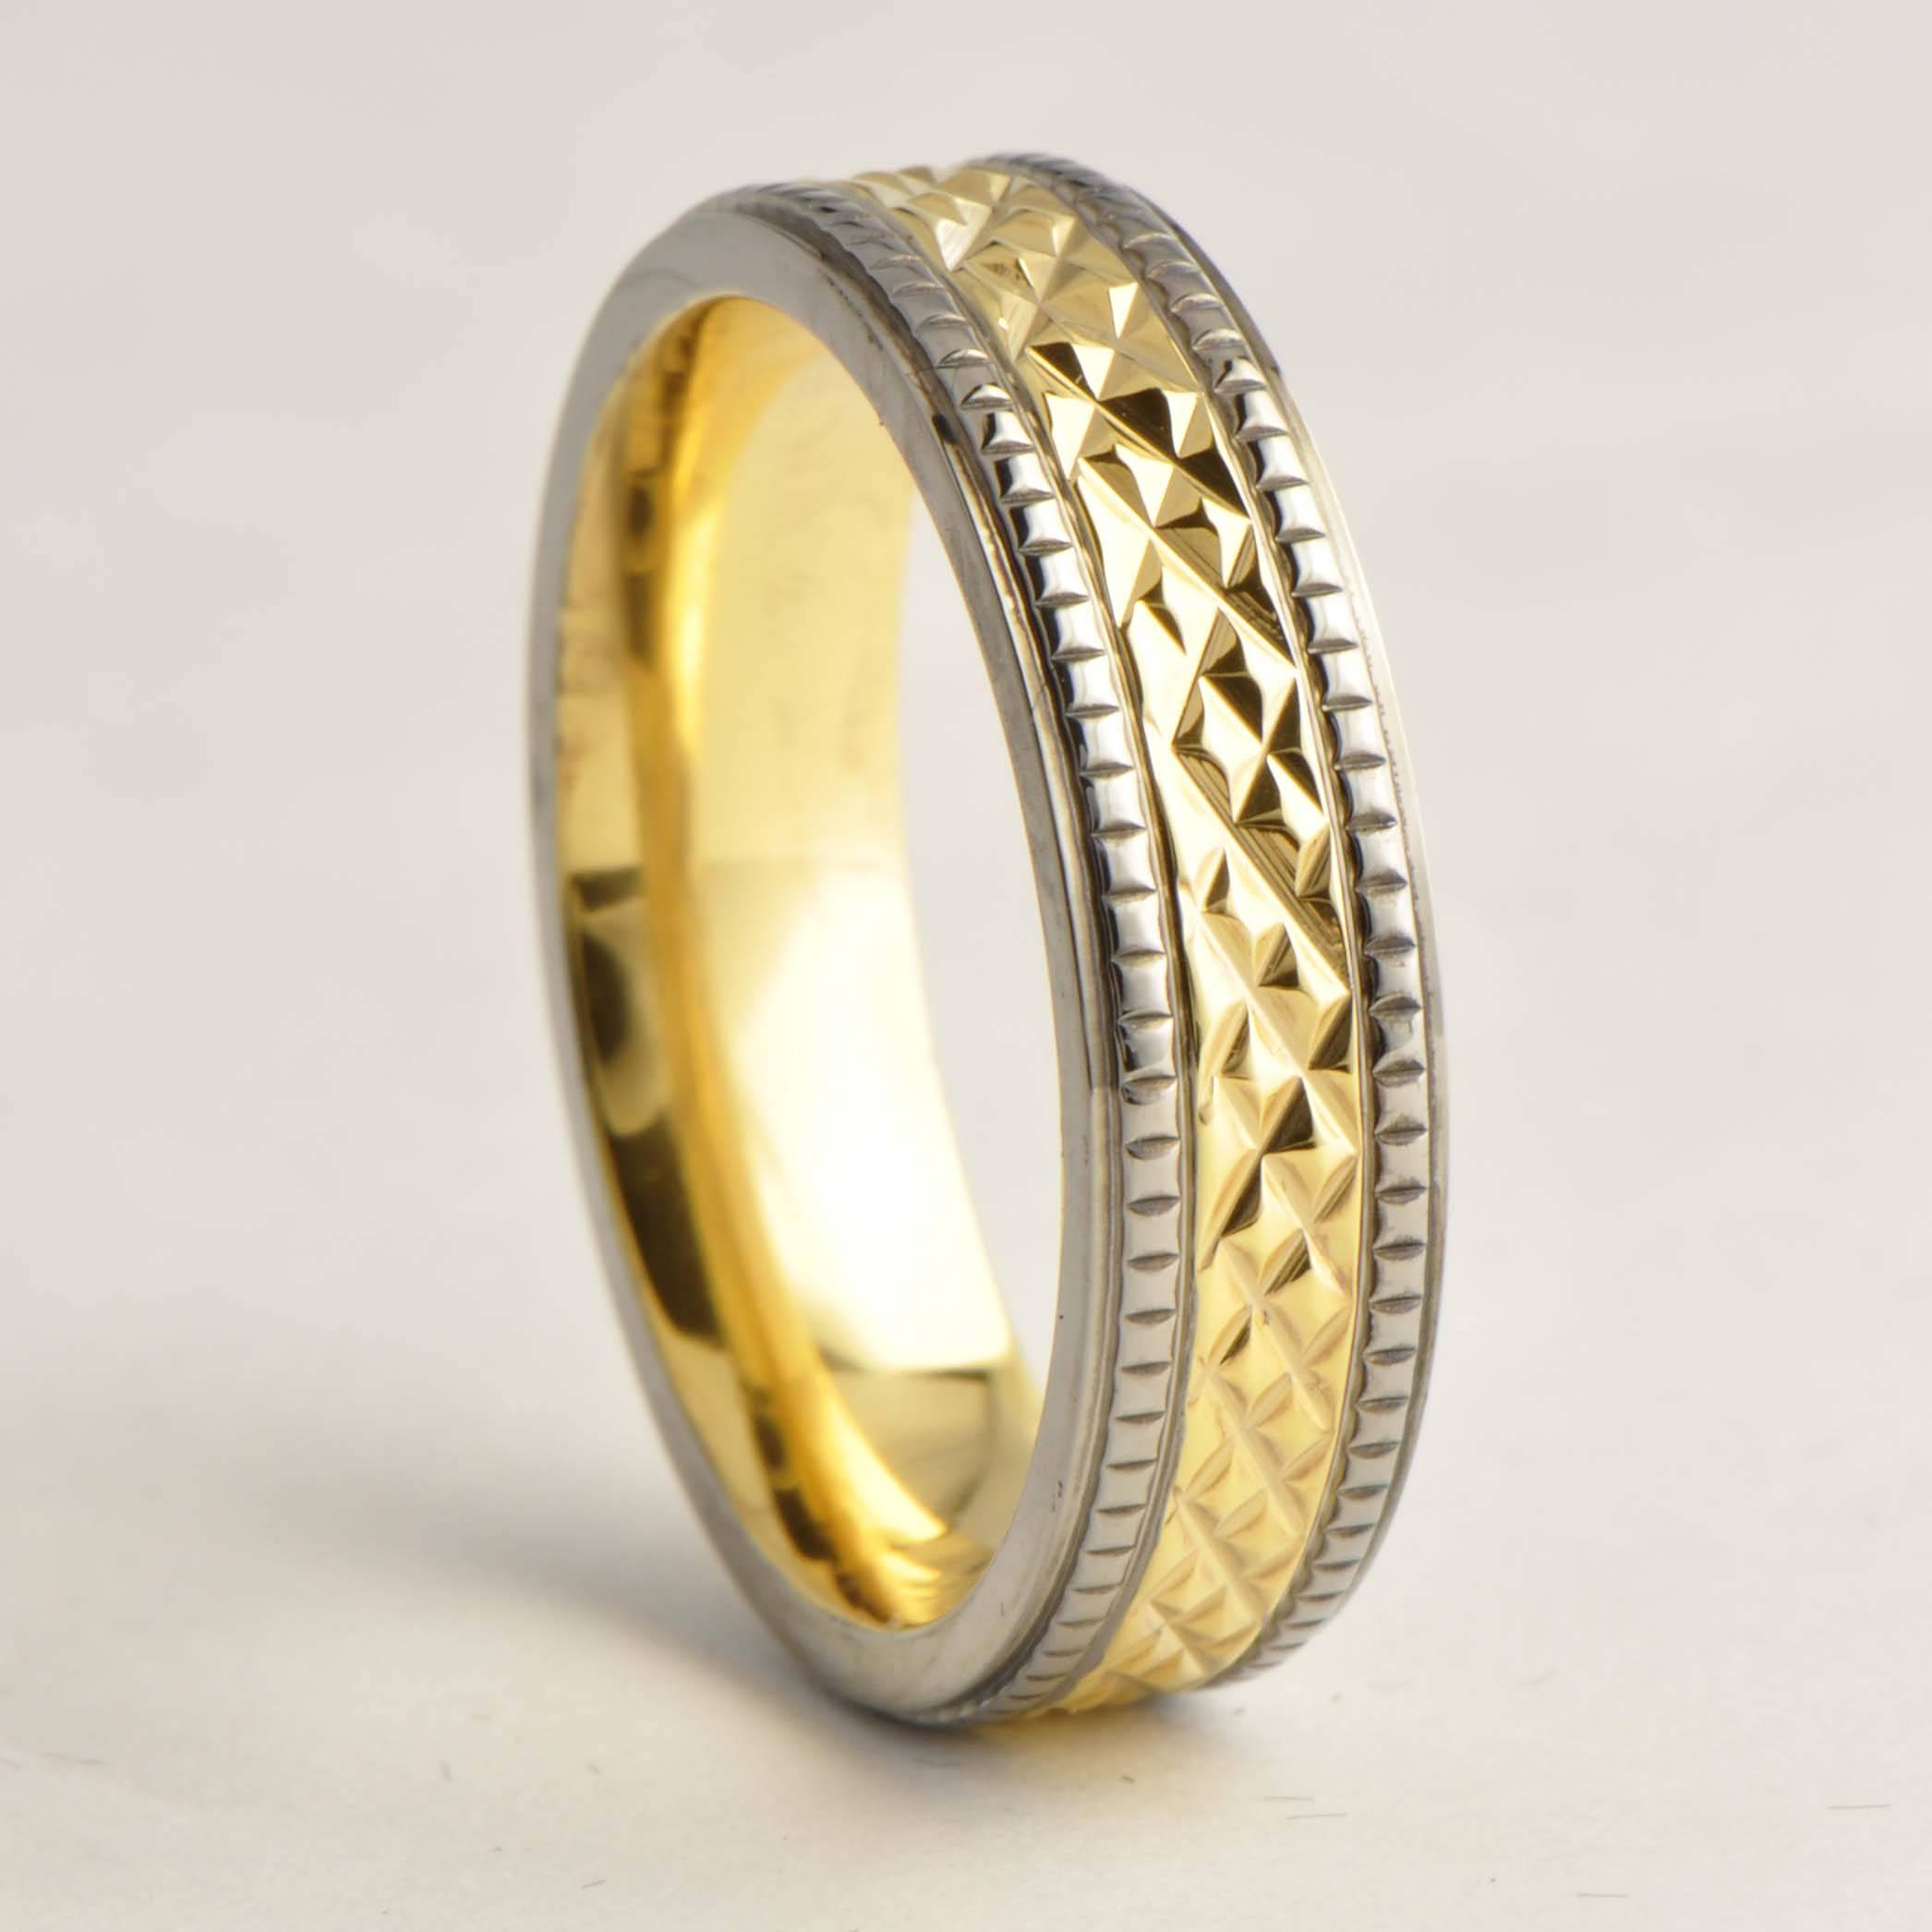 18K Gold Plated Titanium Wedding Rings For Women